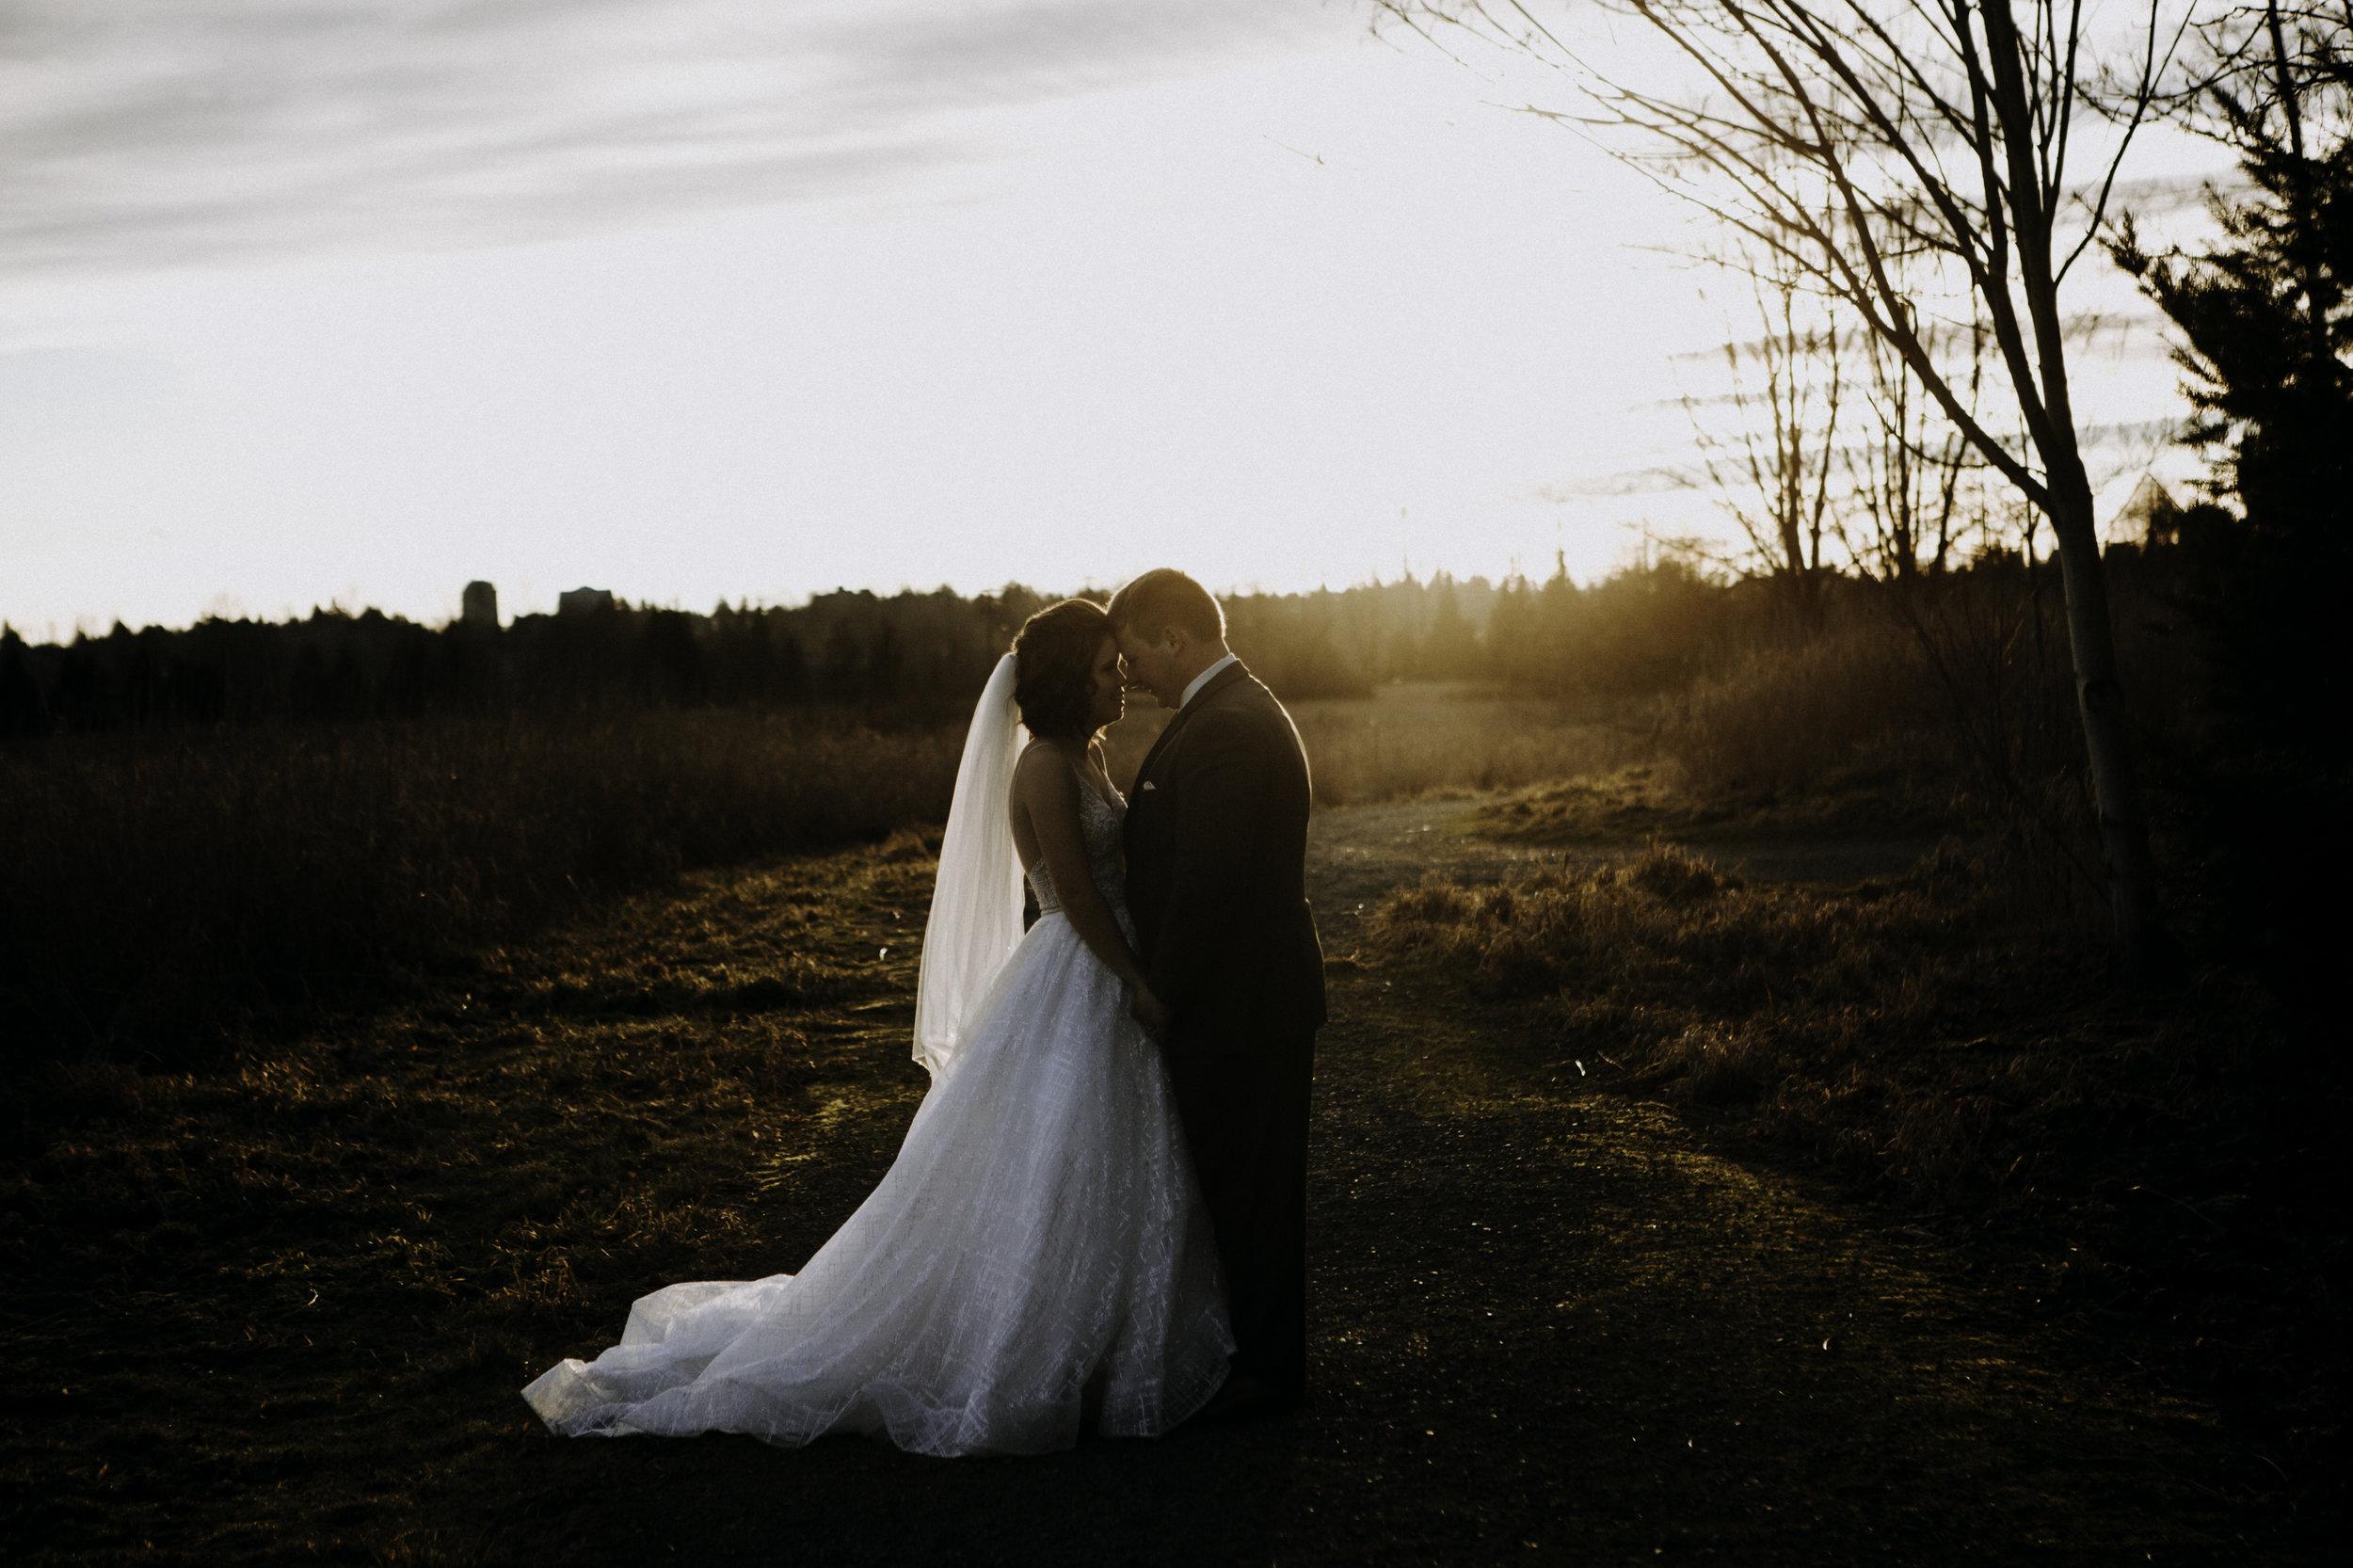 weddingcouplelove-46.jpg